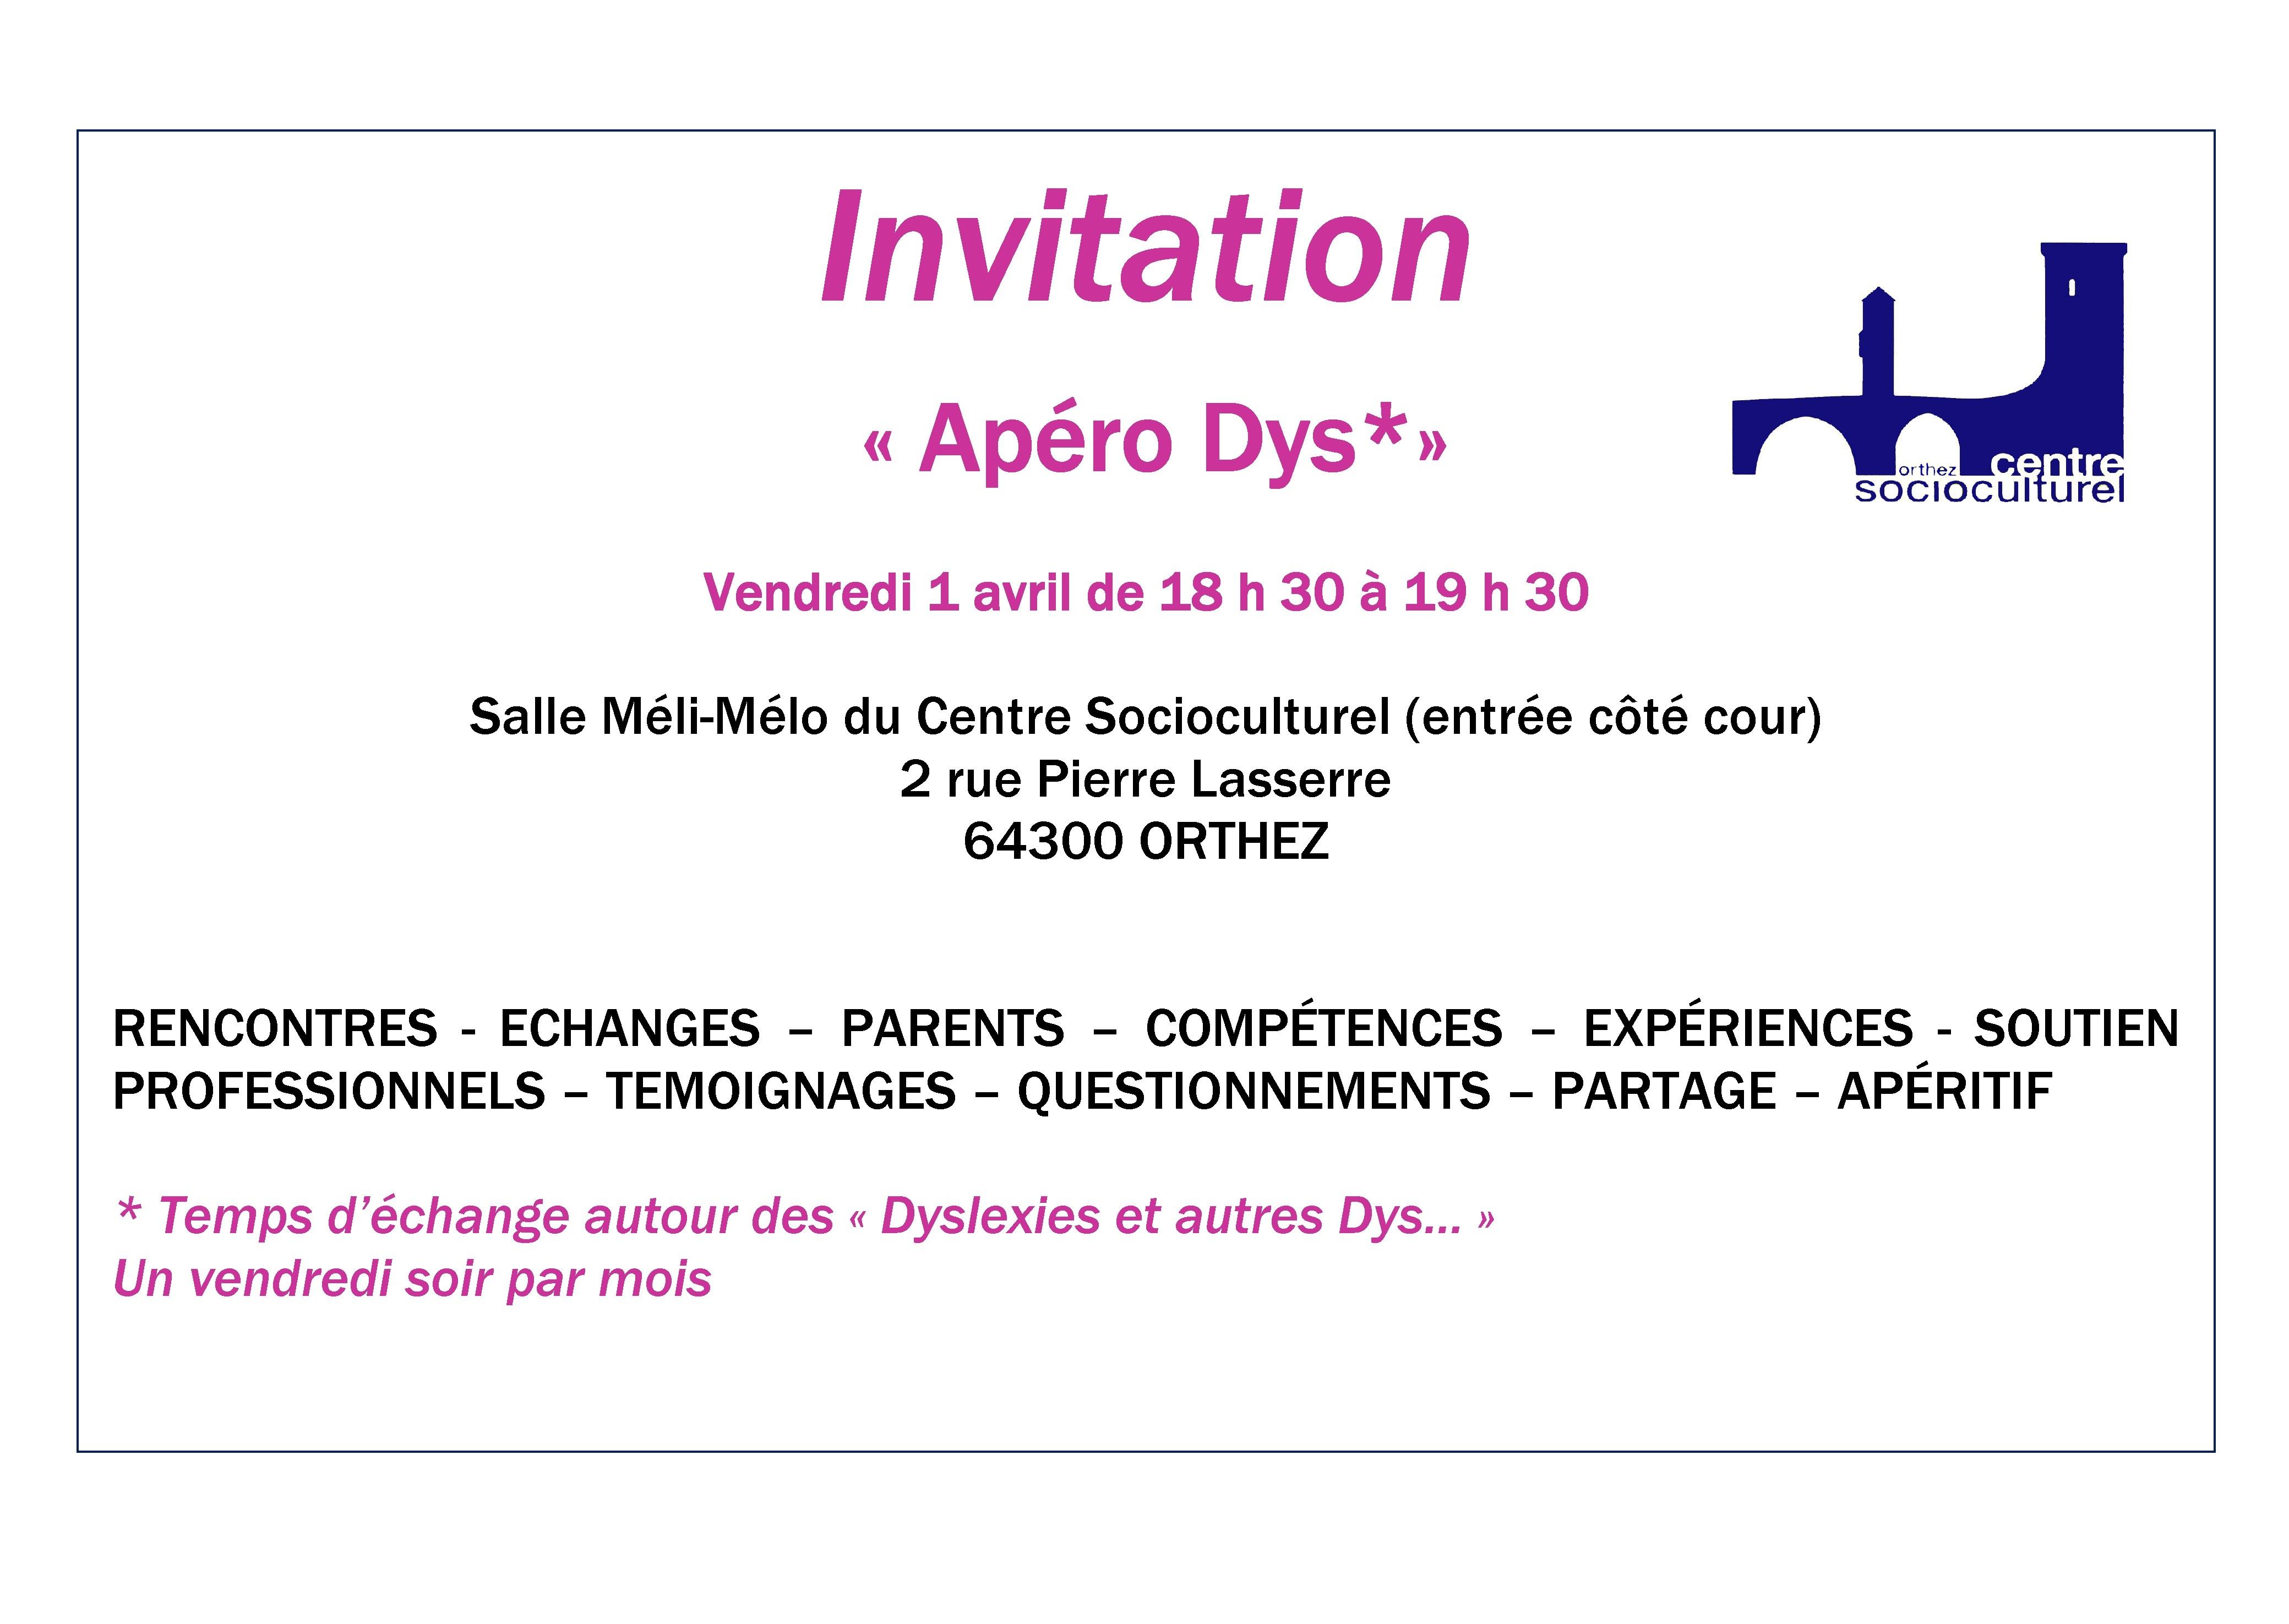 Apero Dys 04-2016